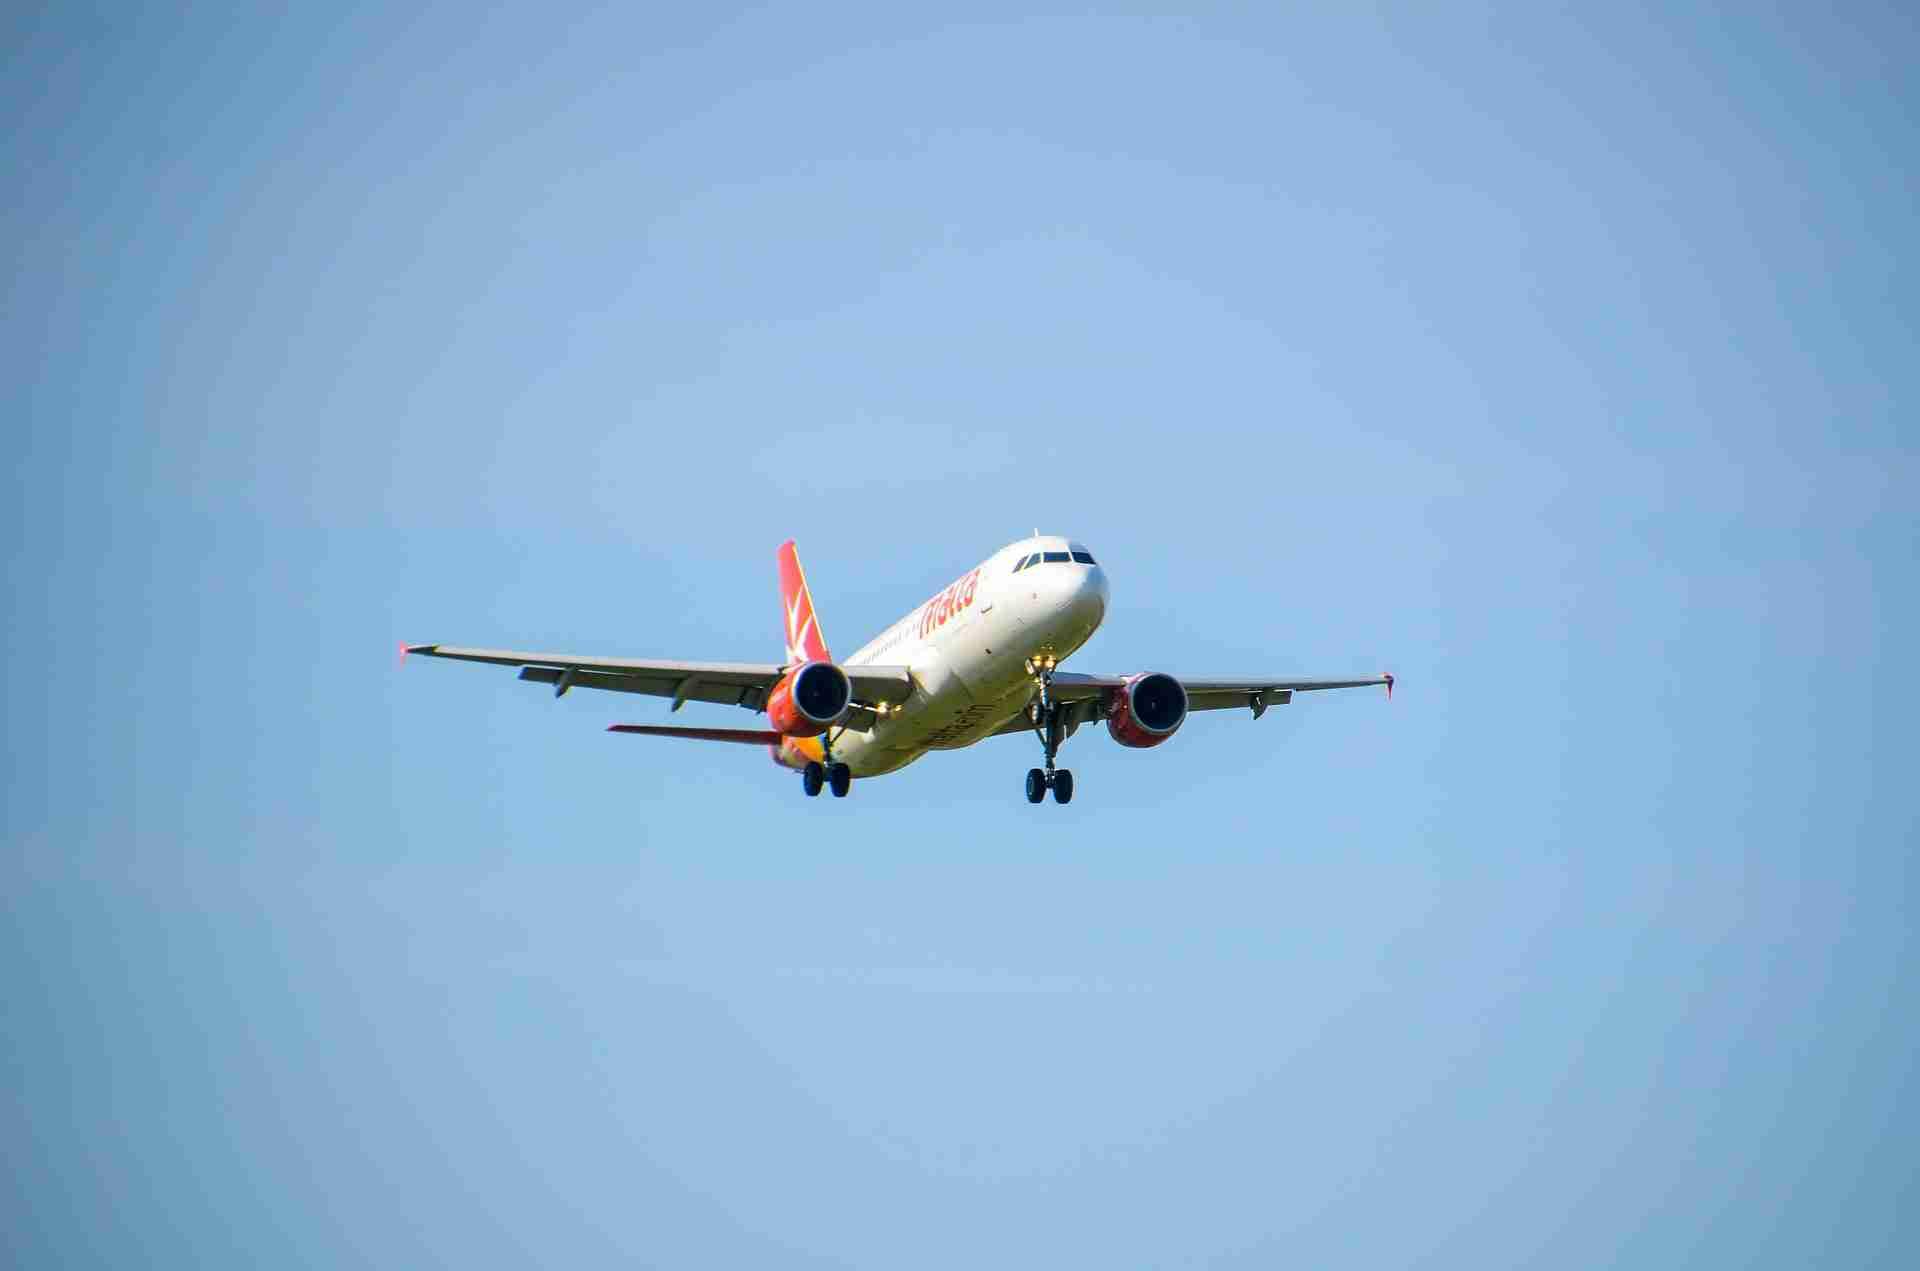 Malta Air Corona